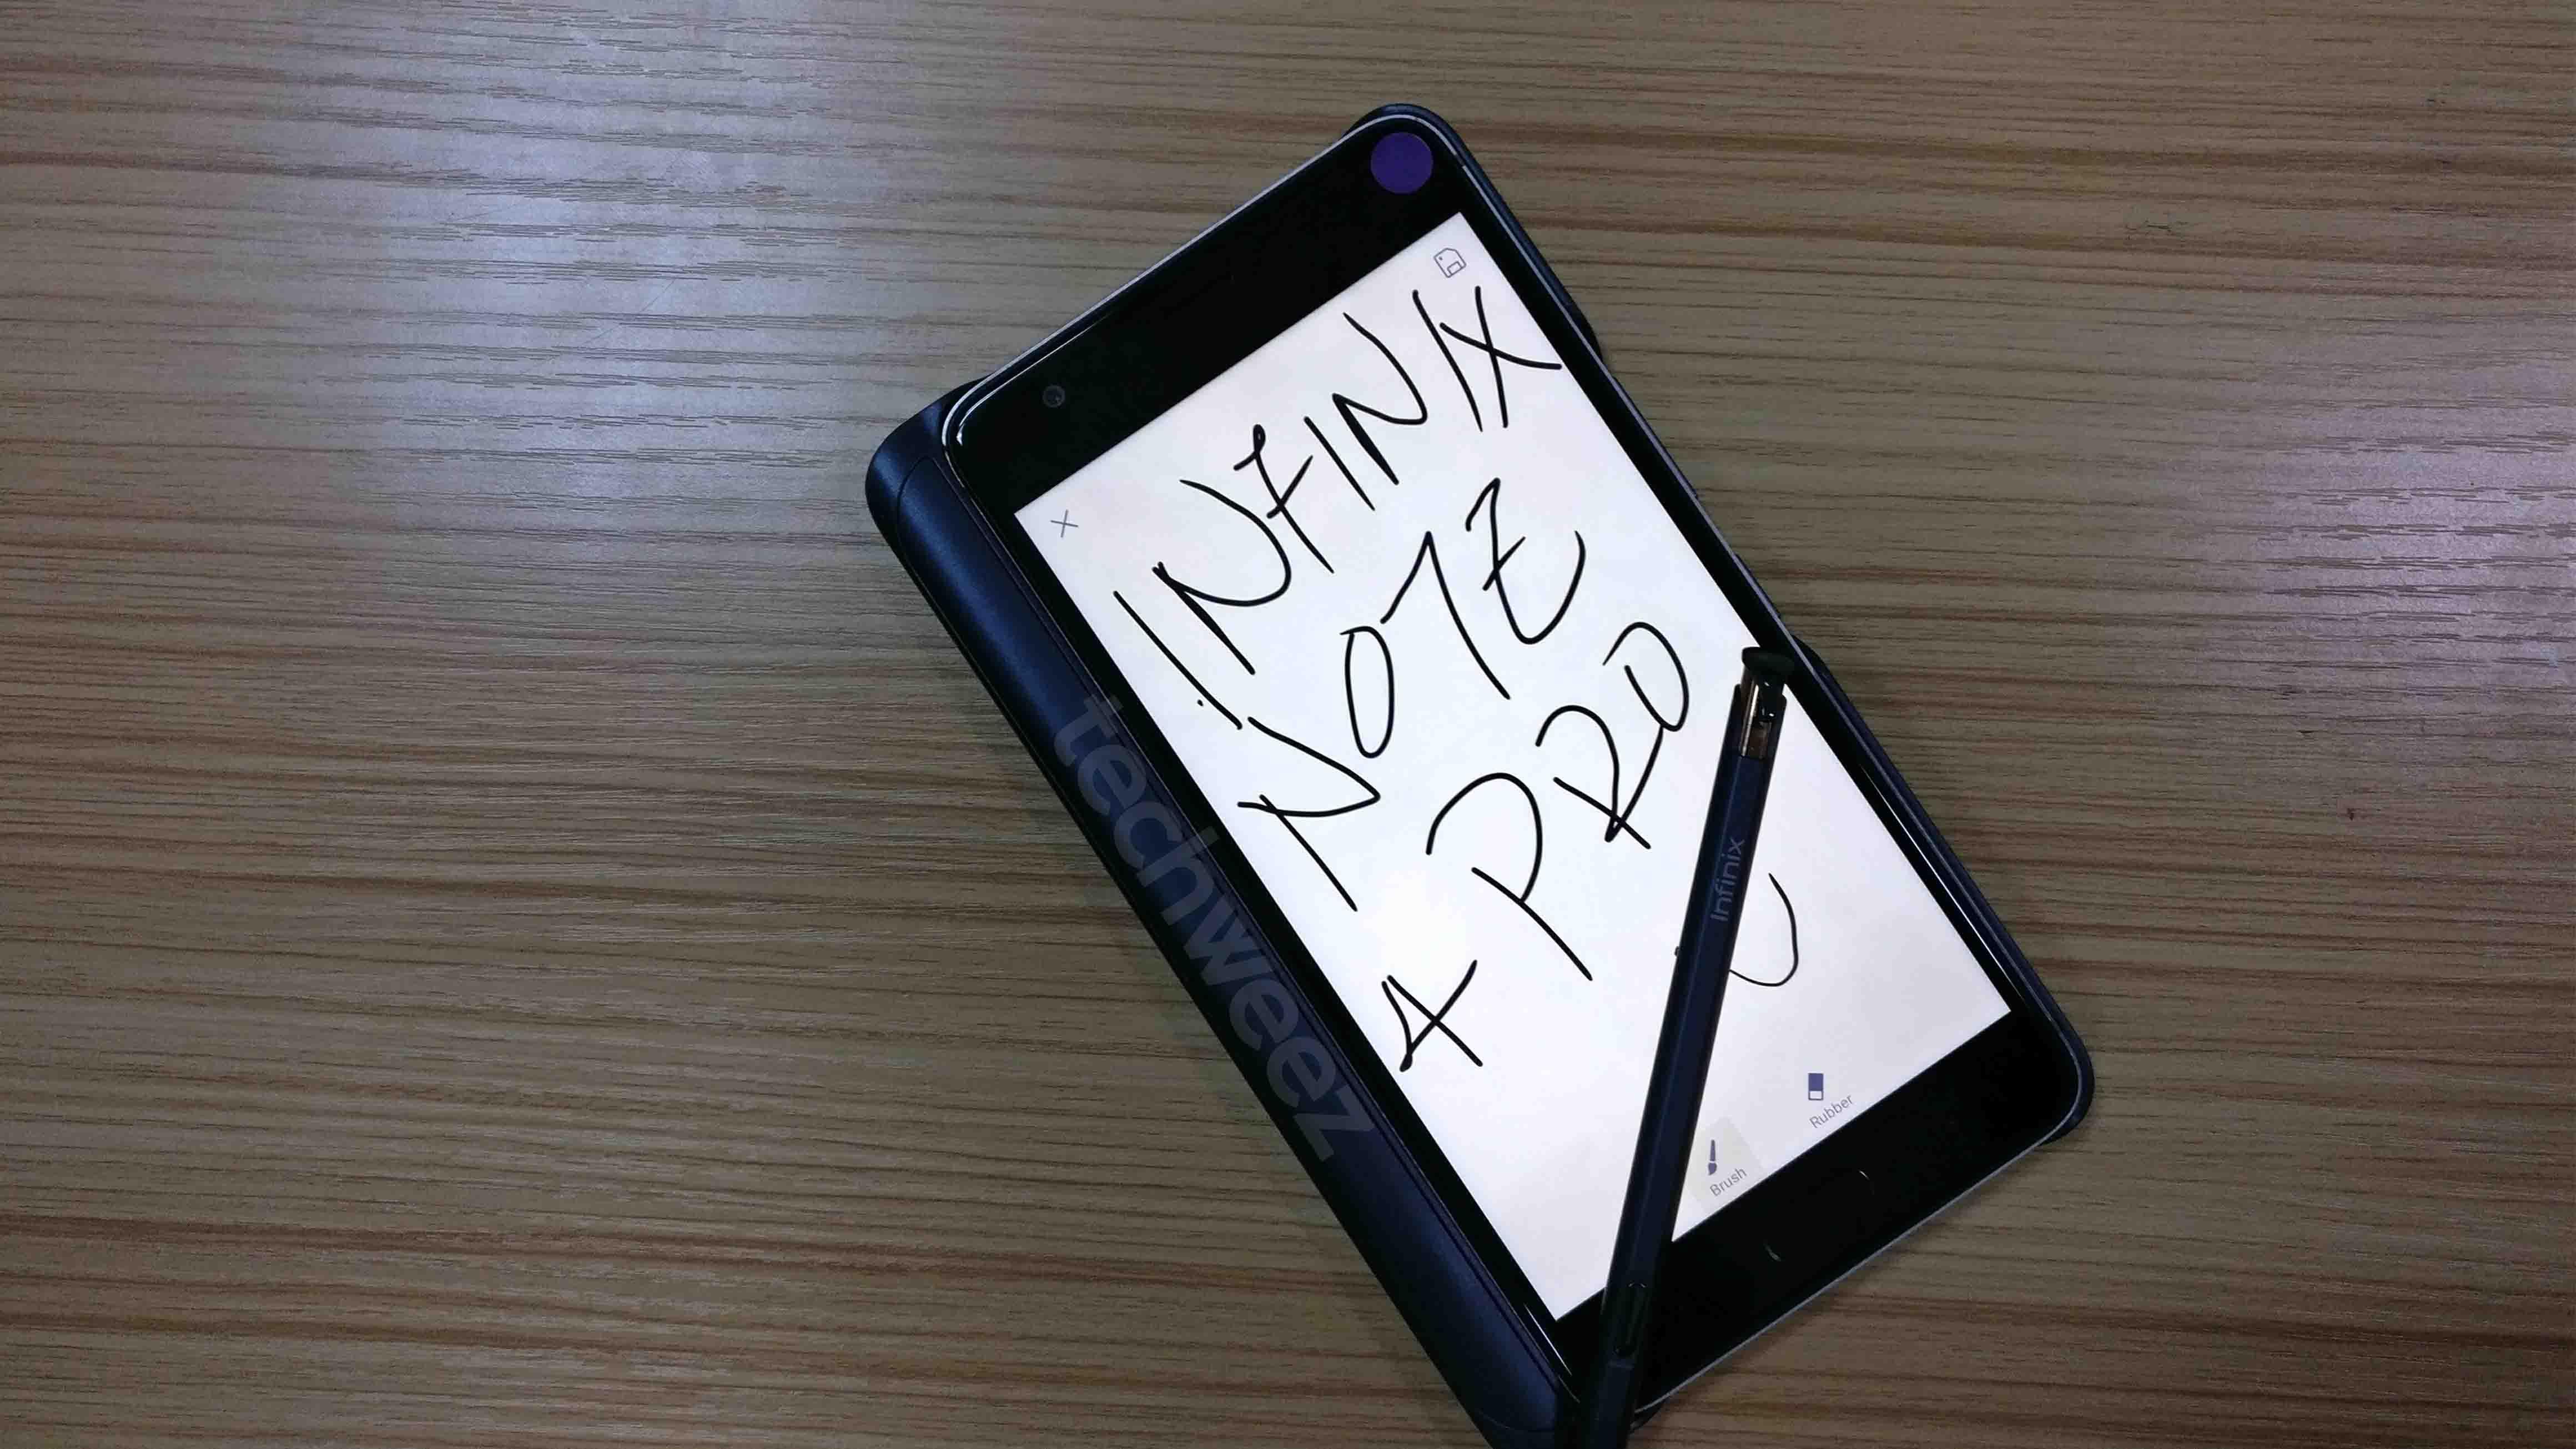 Infinix Note 4 Pro